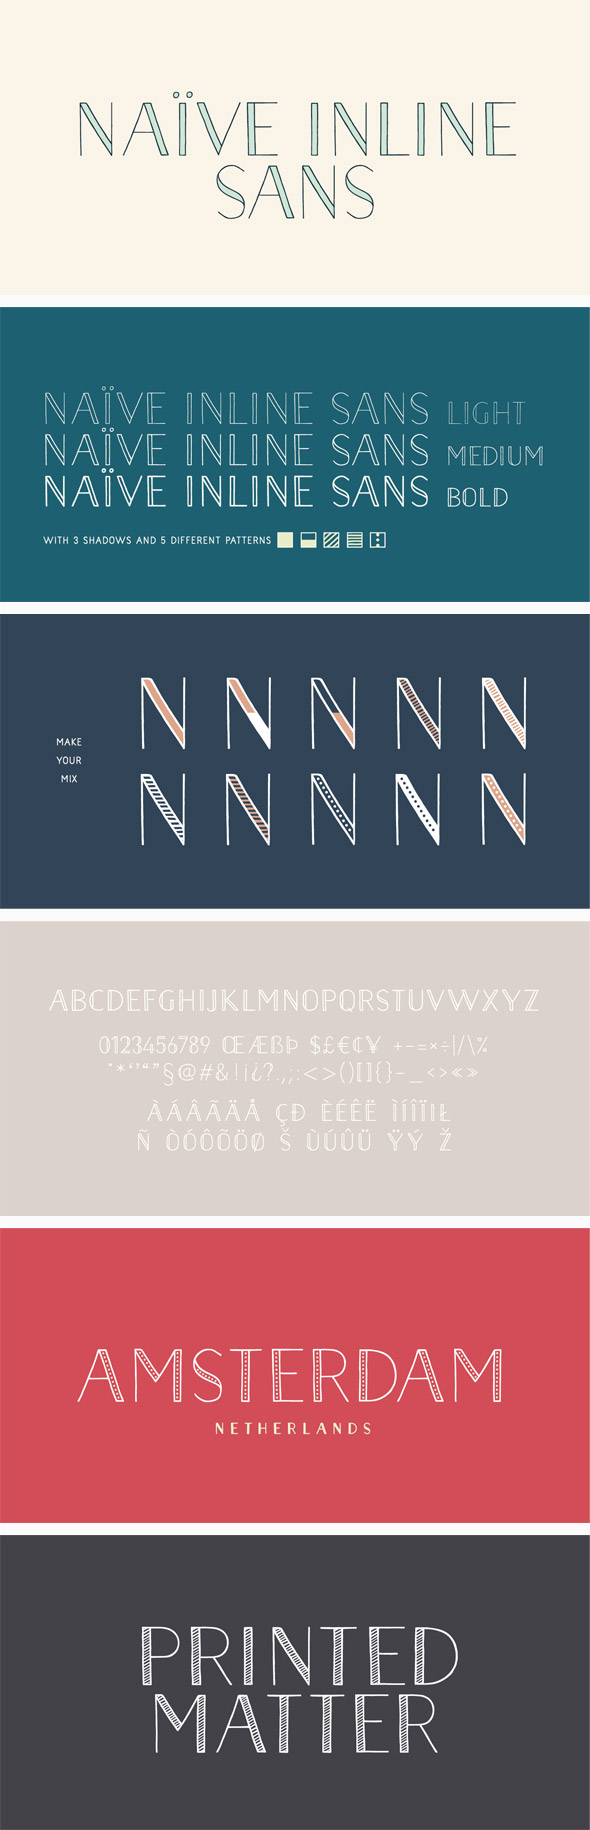 Naive Inline Sans Font Pack - Handwriting Fonts